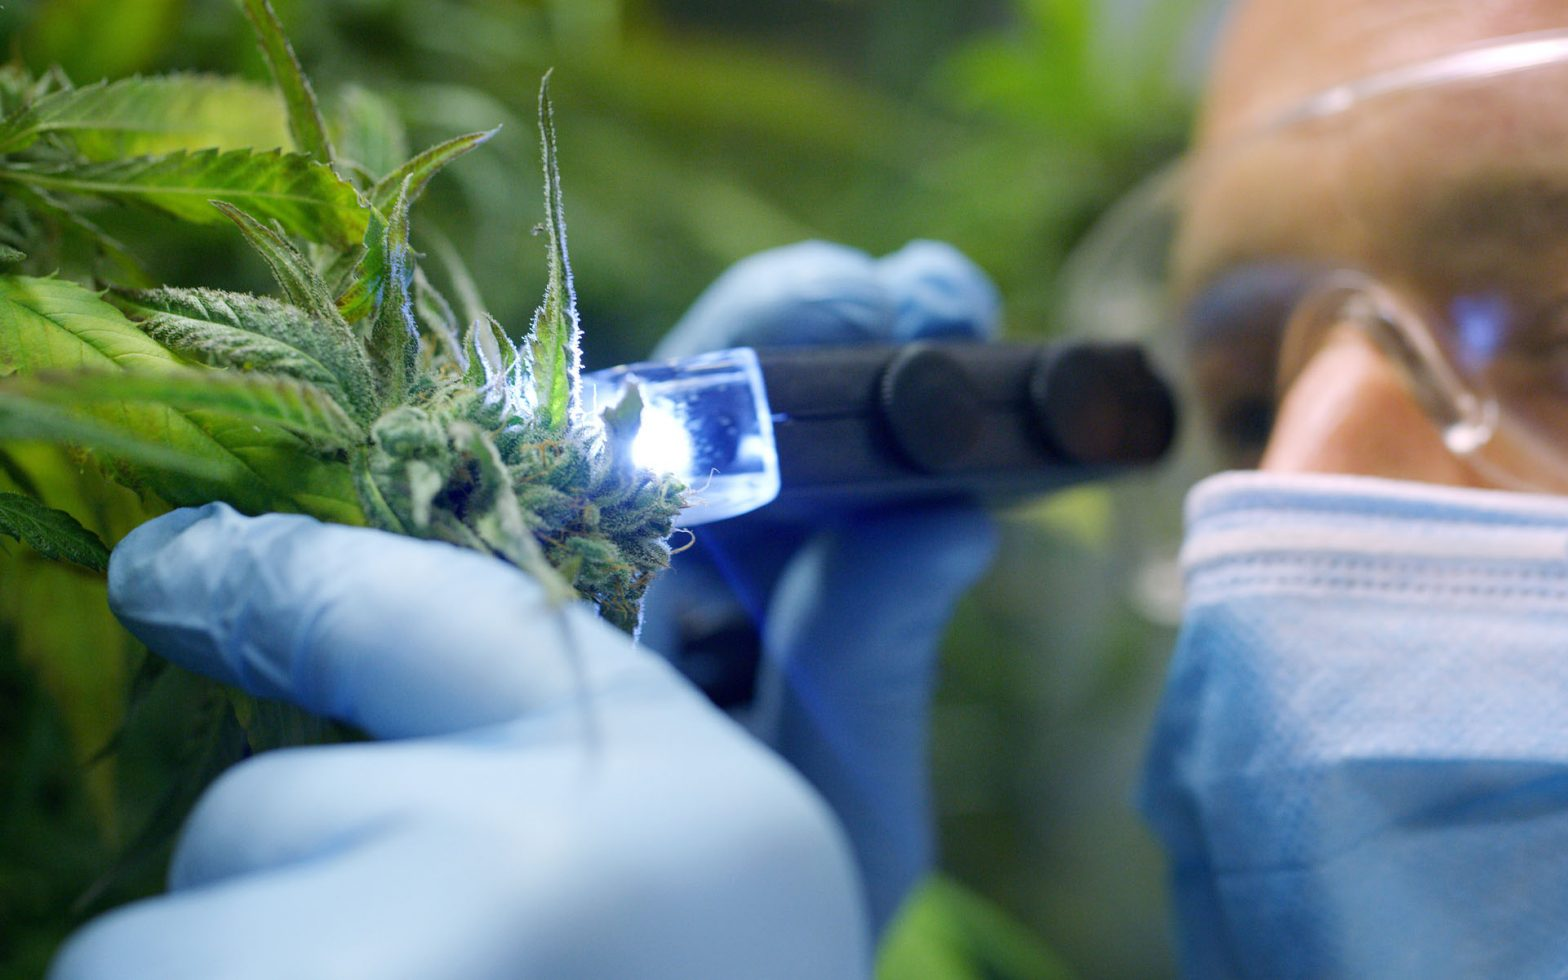 Reasons Why You Should Go For Full Spectrum CBD Botanical Blends